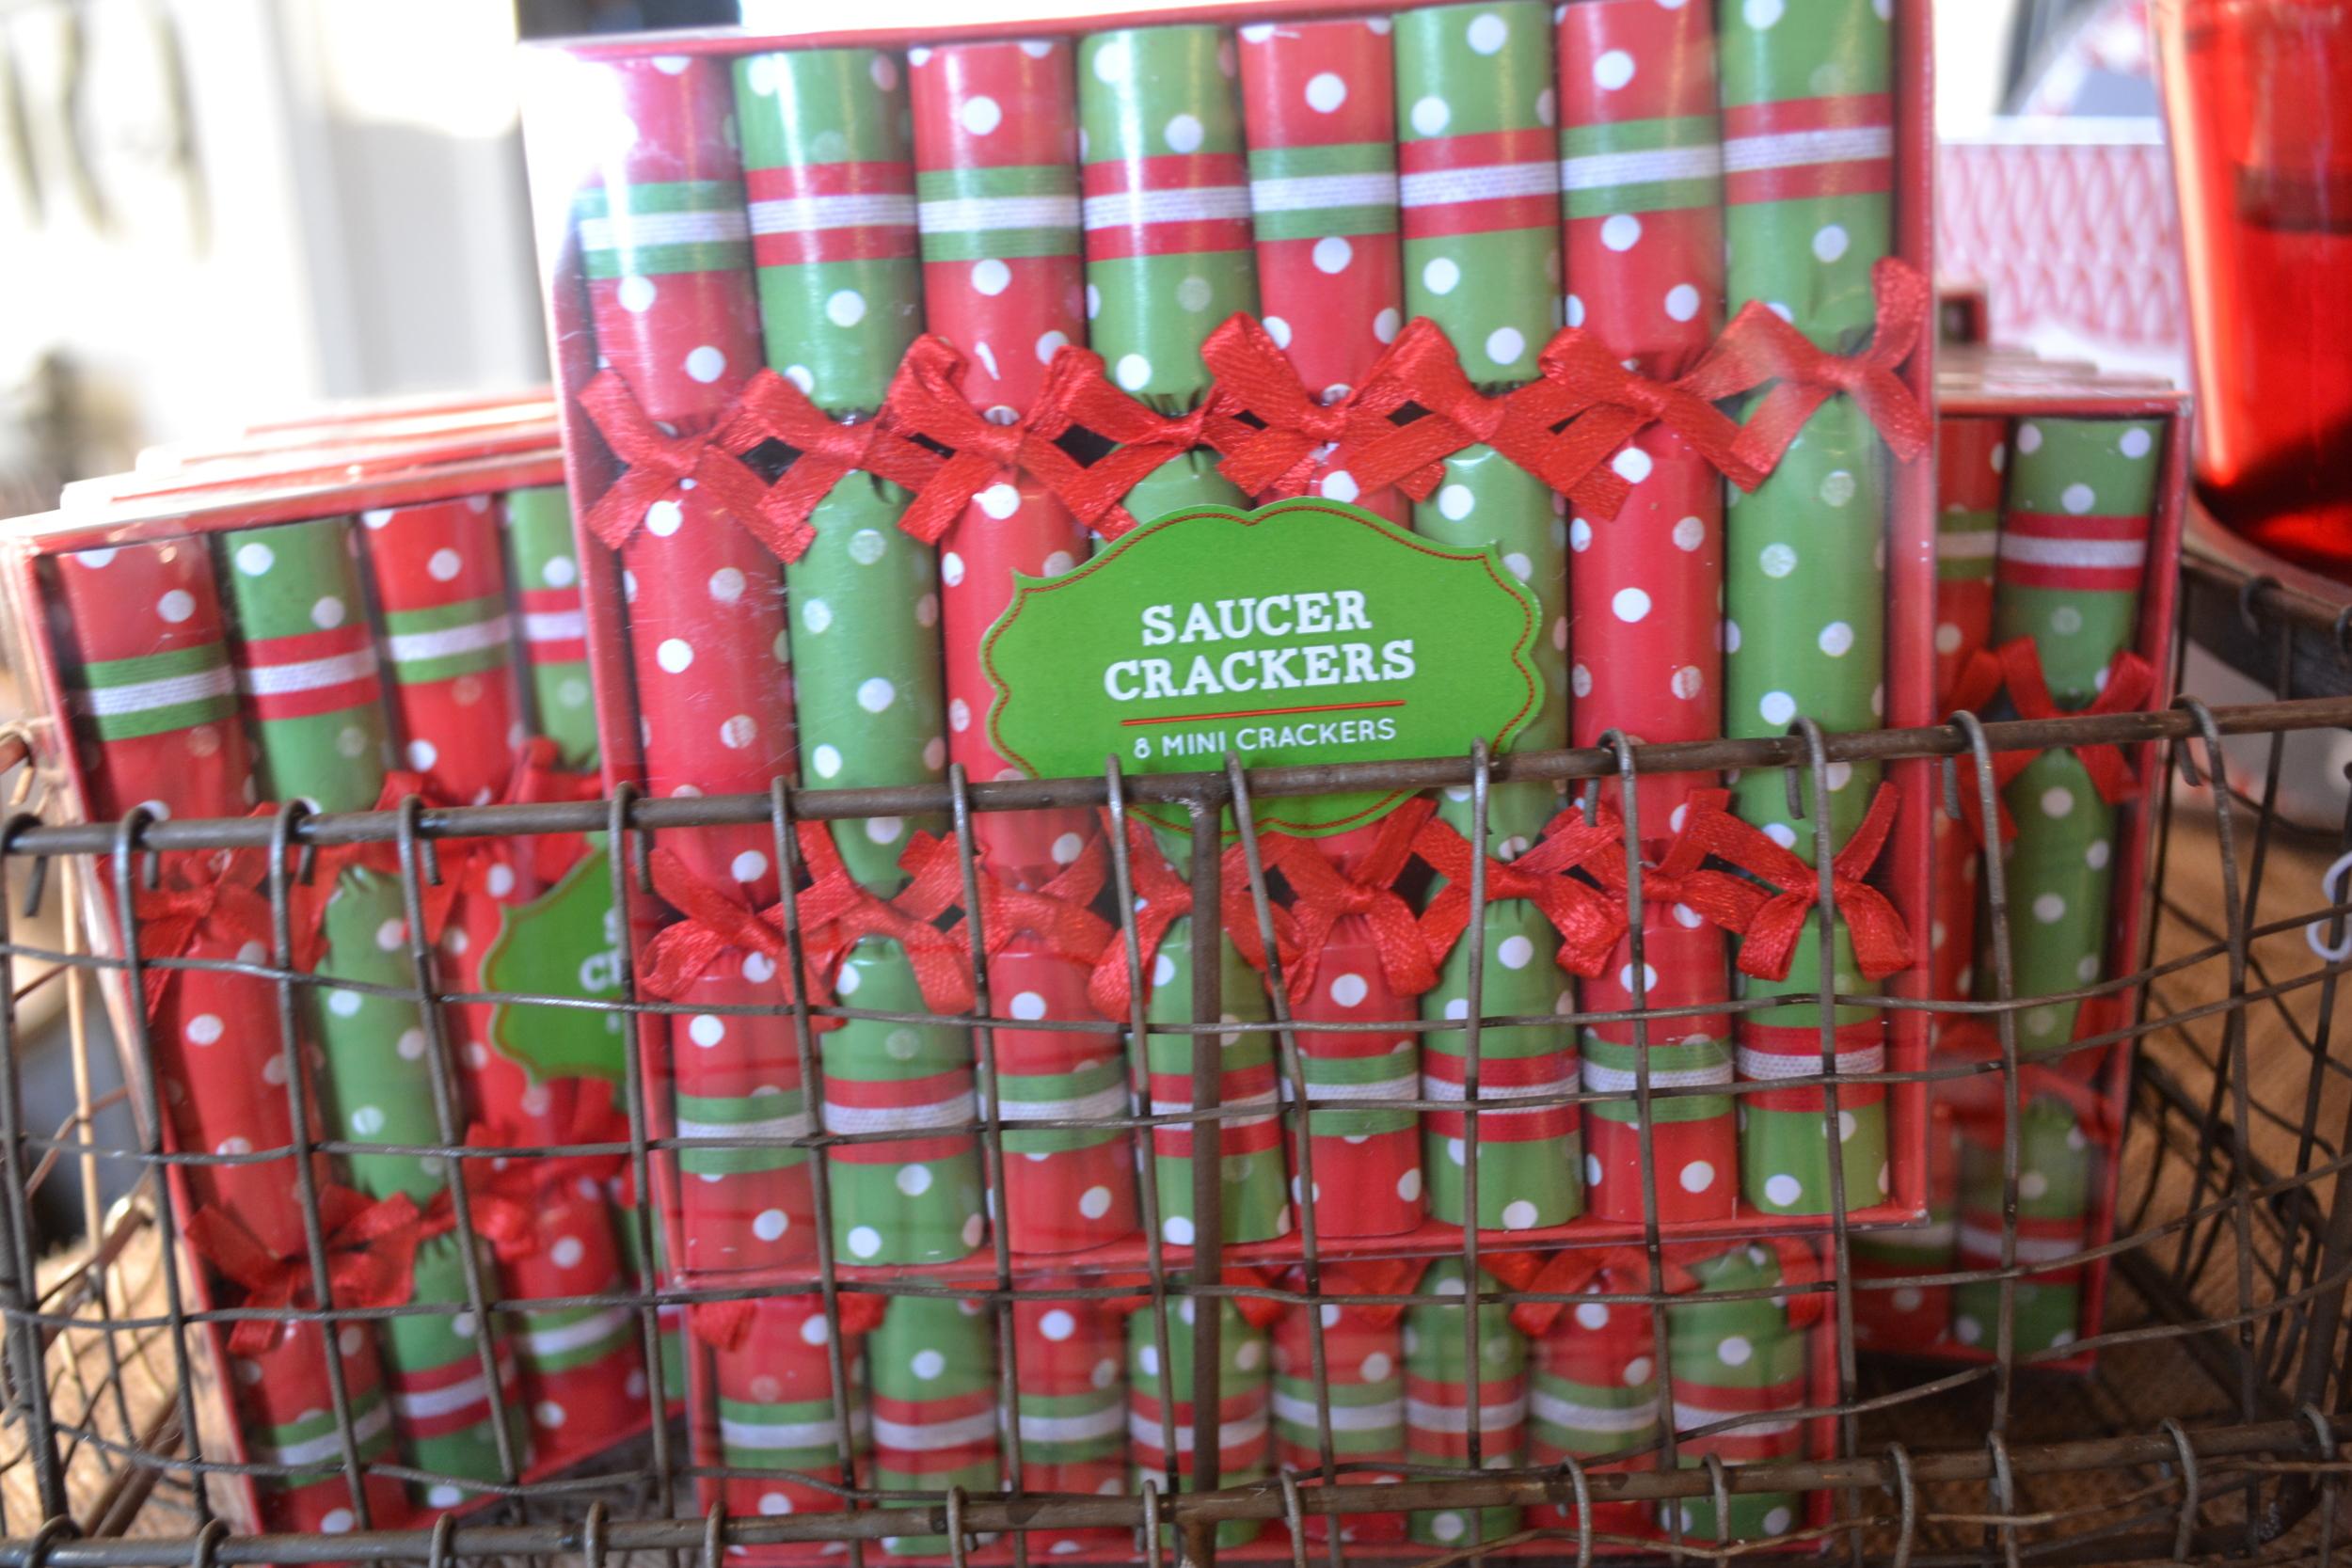 Saucer crackers